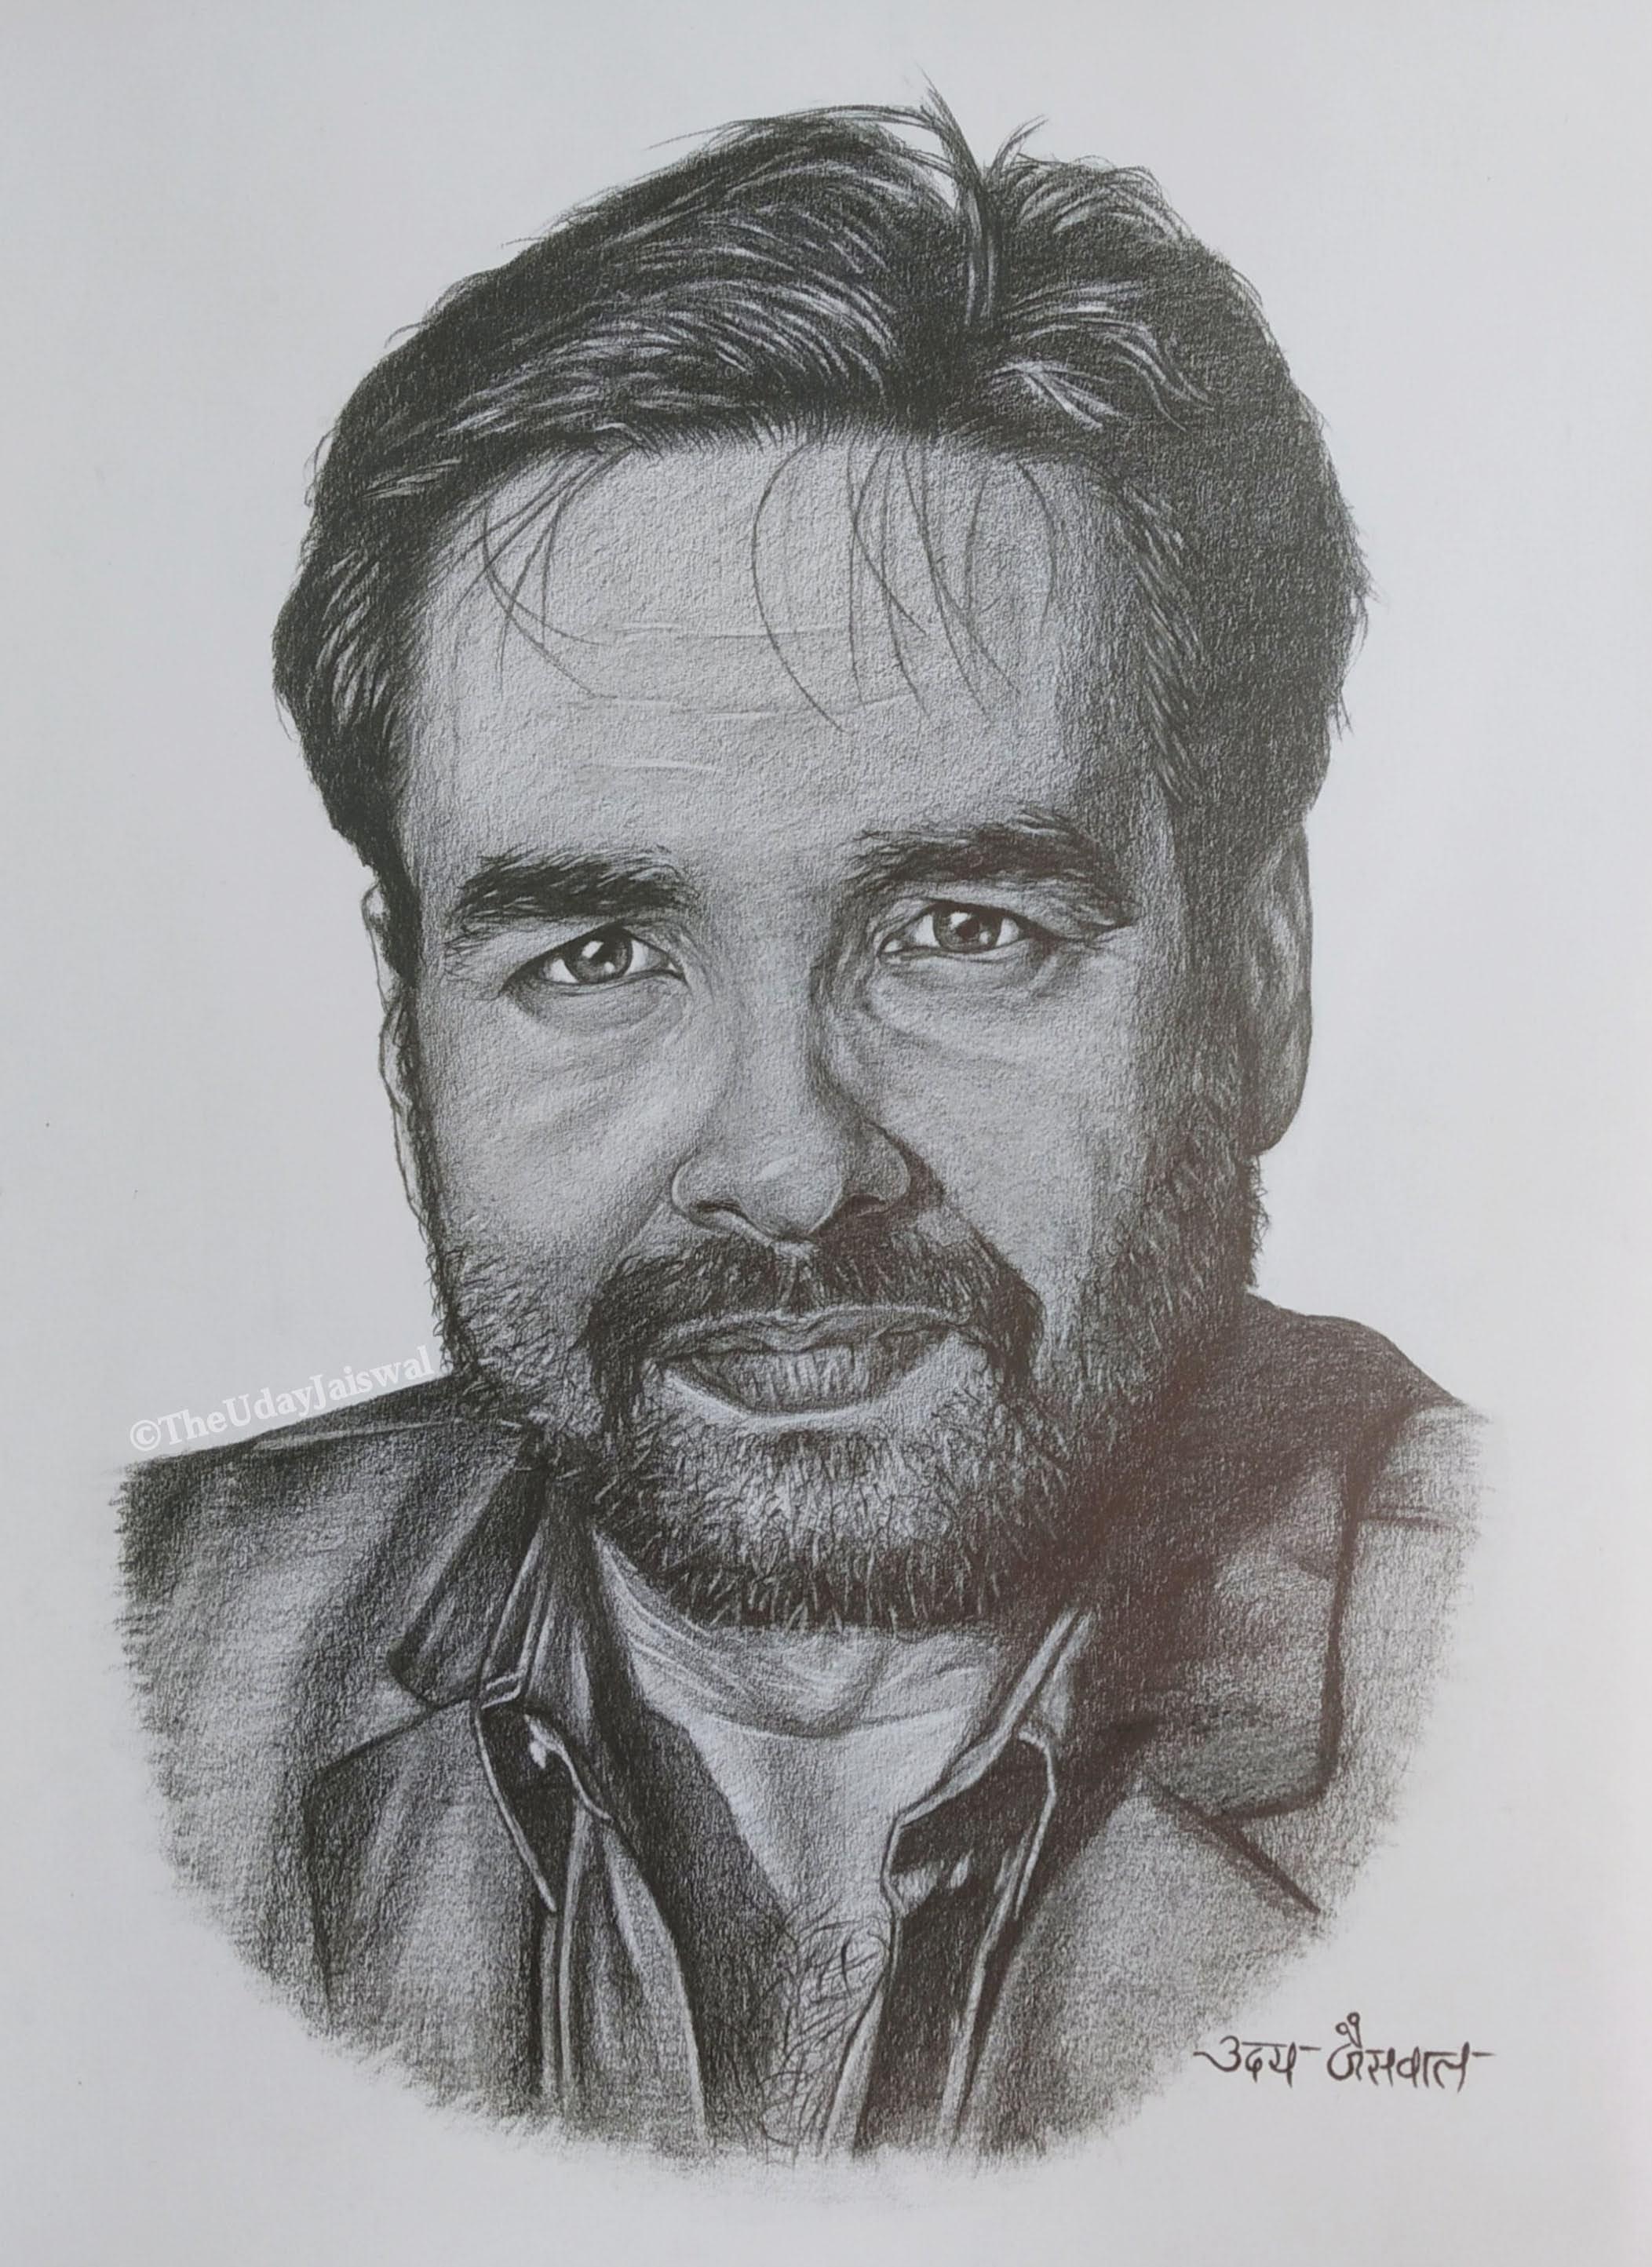 Mr. Pankaj Tripathi Realistic Pencil Sketch